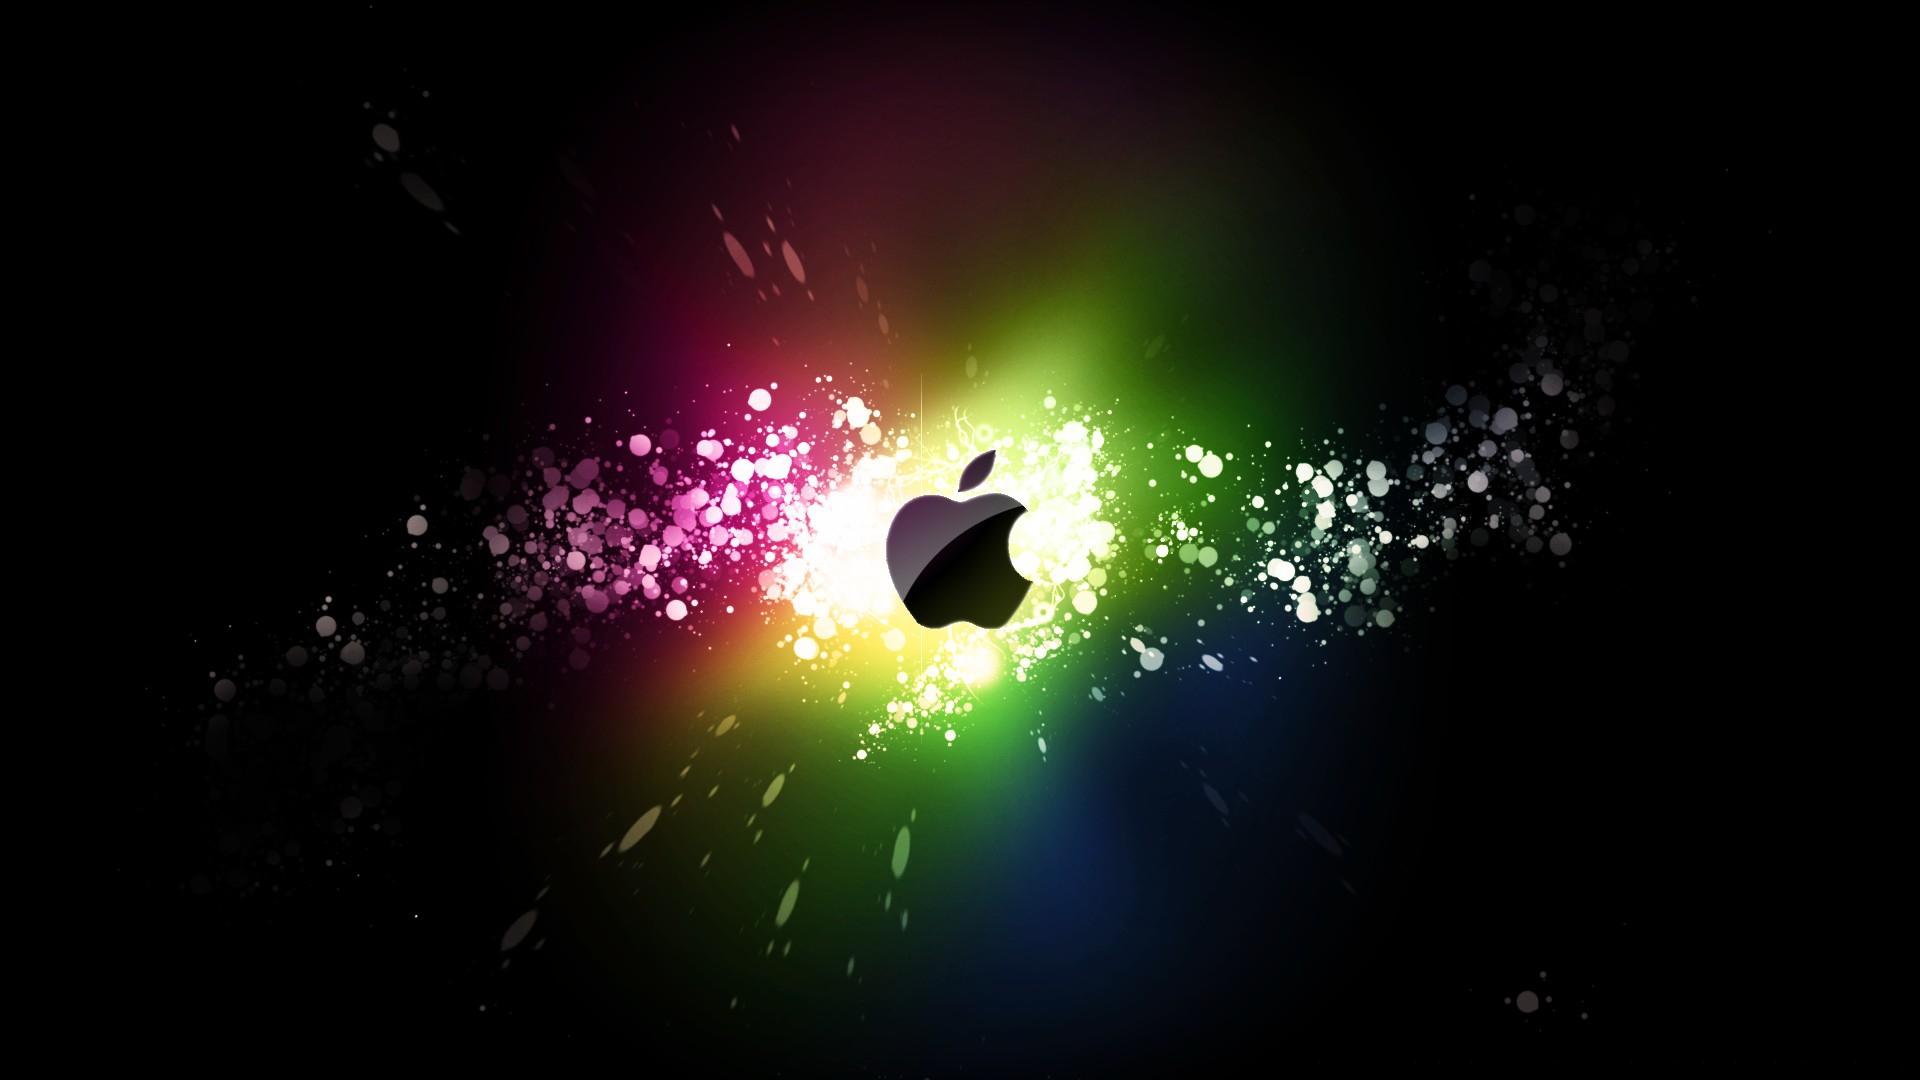 Well Apple Wallpapers For Desktop Hd Live Wallpaper